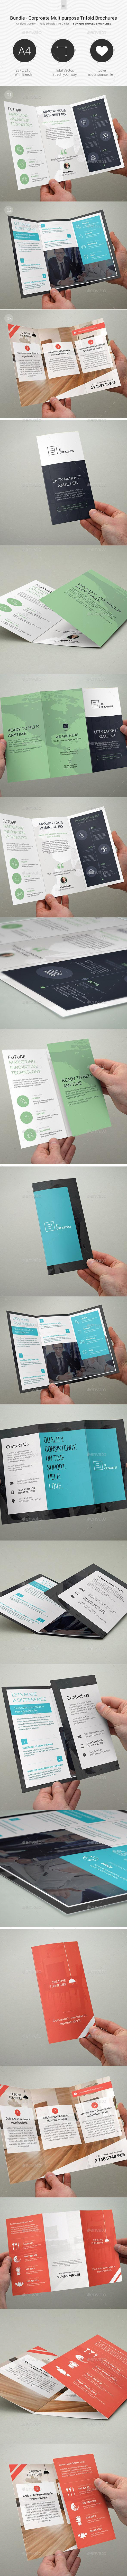 GraphicRiver Bundle Multipurpose Trifold Brochures 06 11957951